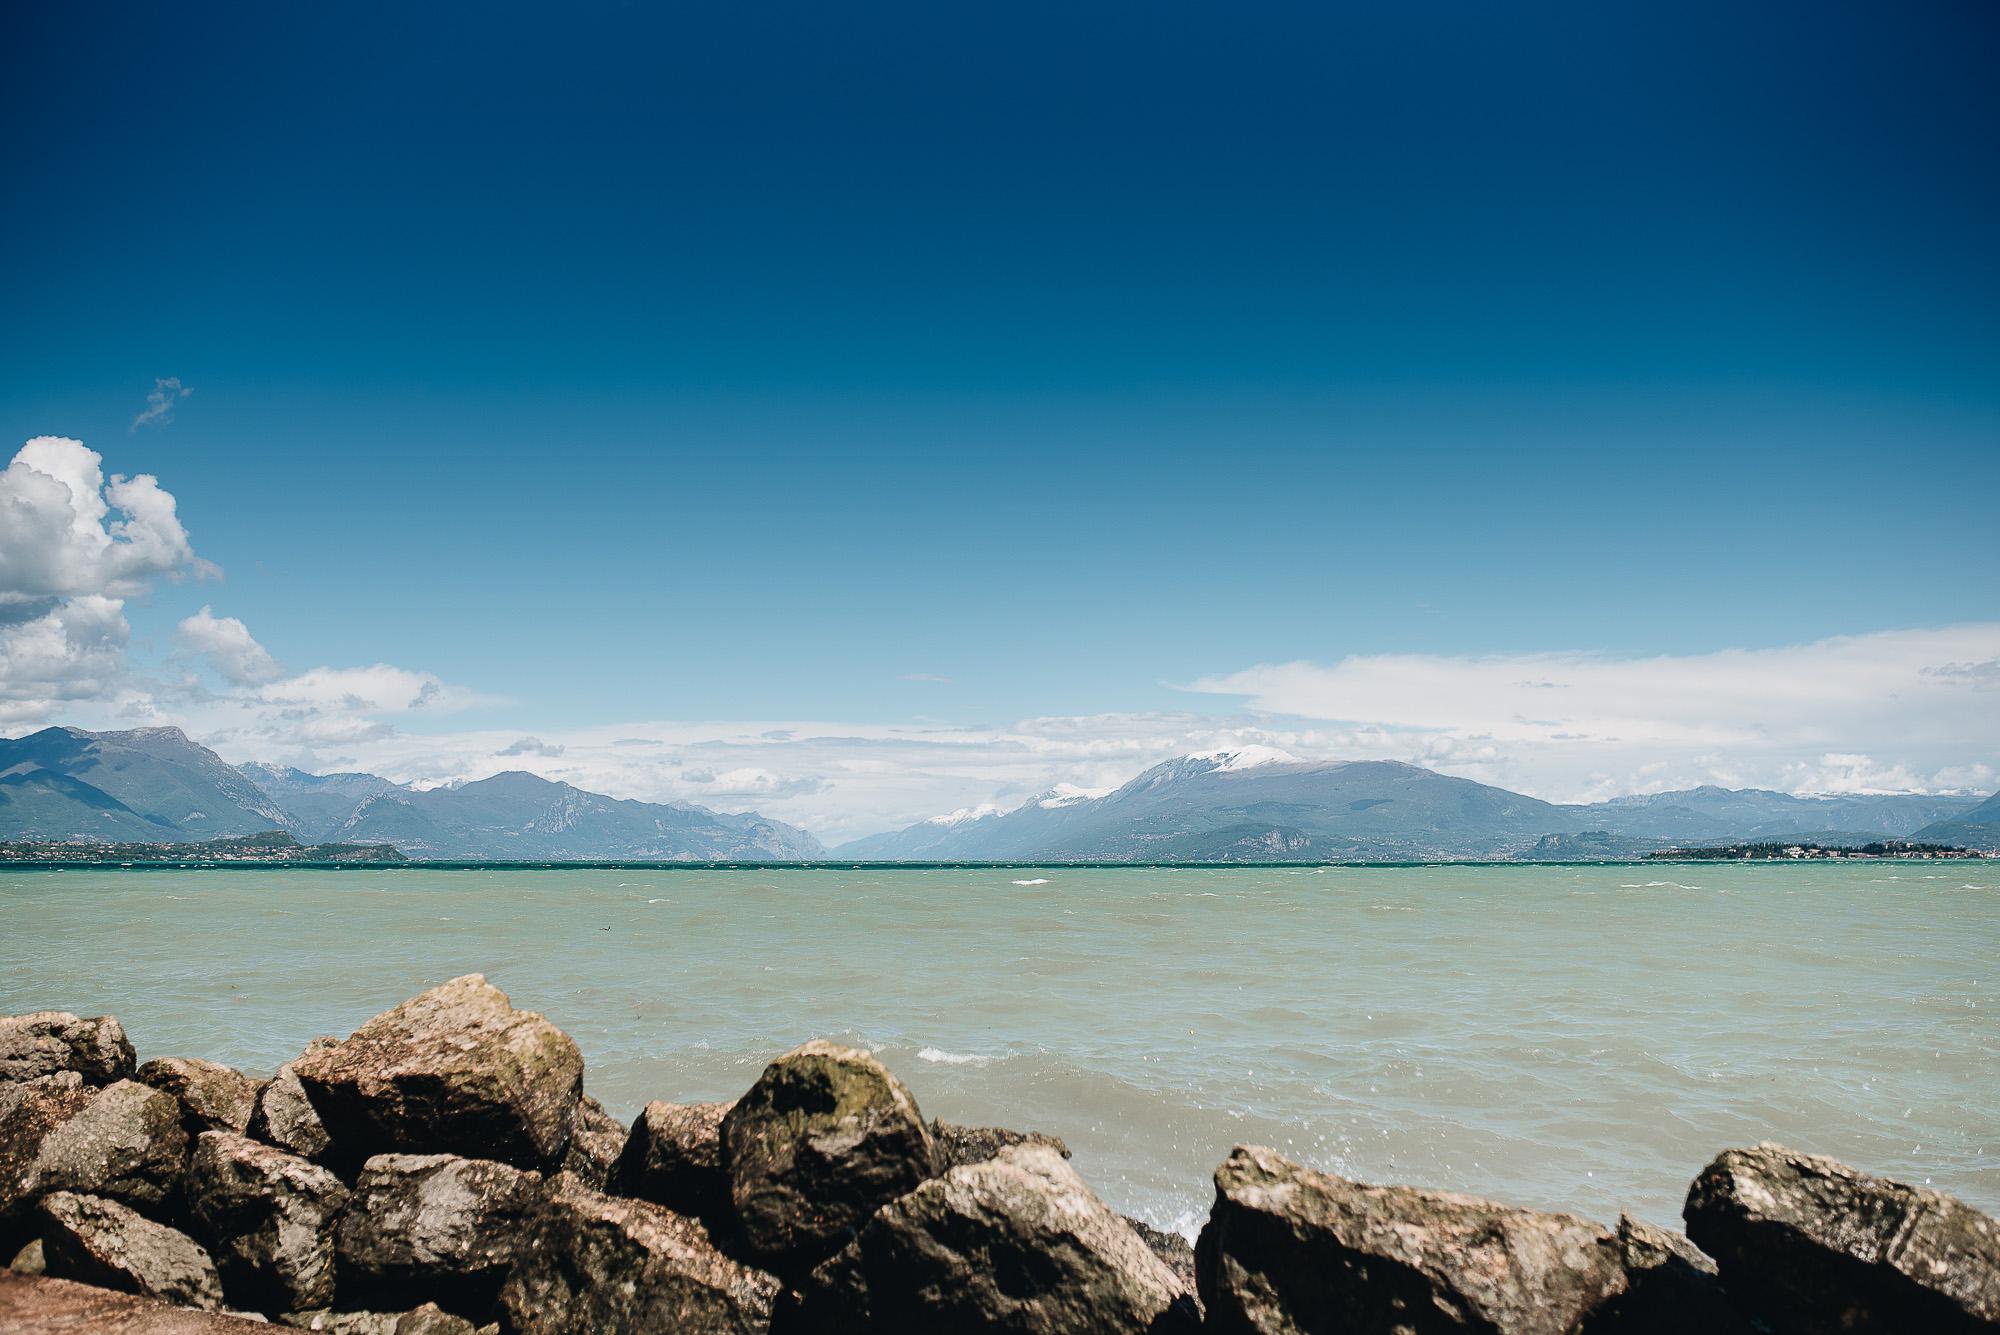 OurBeautifulAdventure-LakeGarda-Italy-Blog-1422.jpg